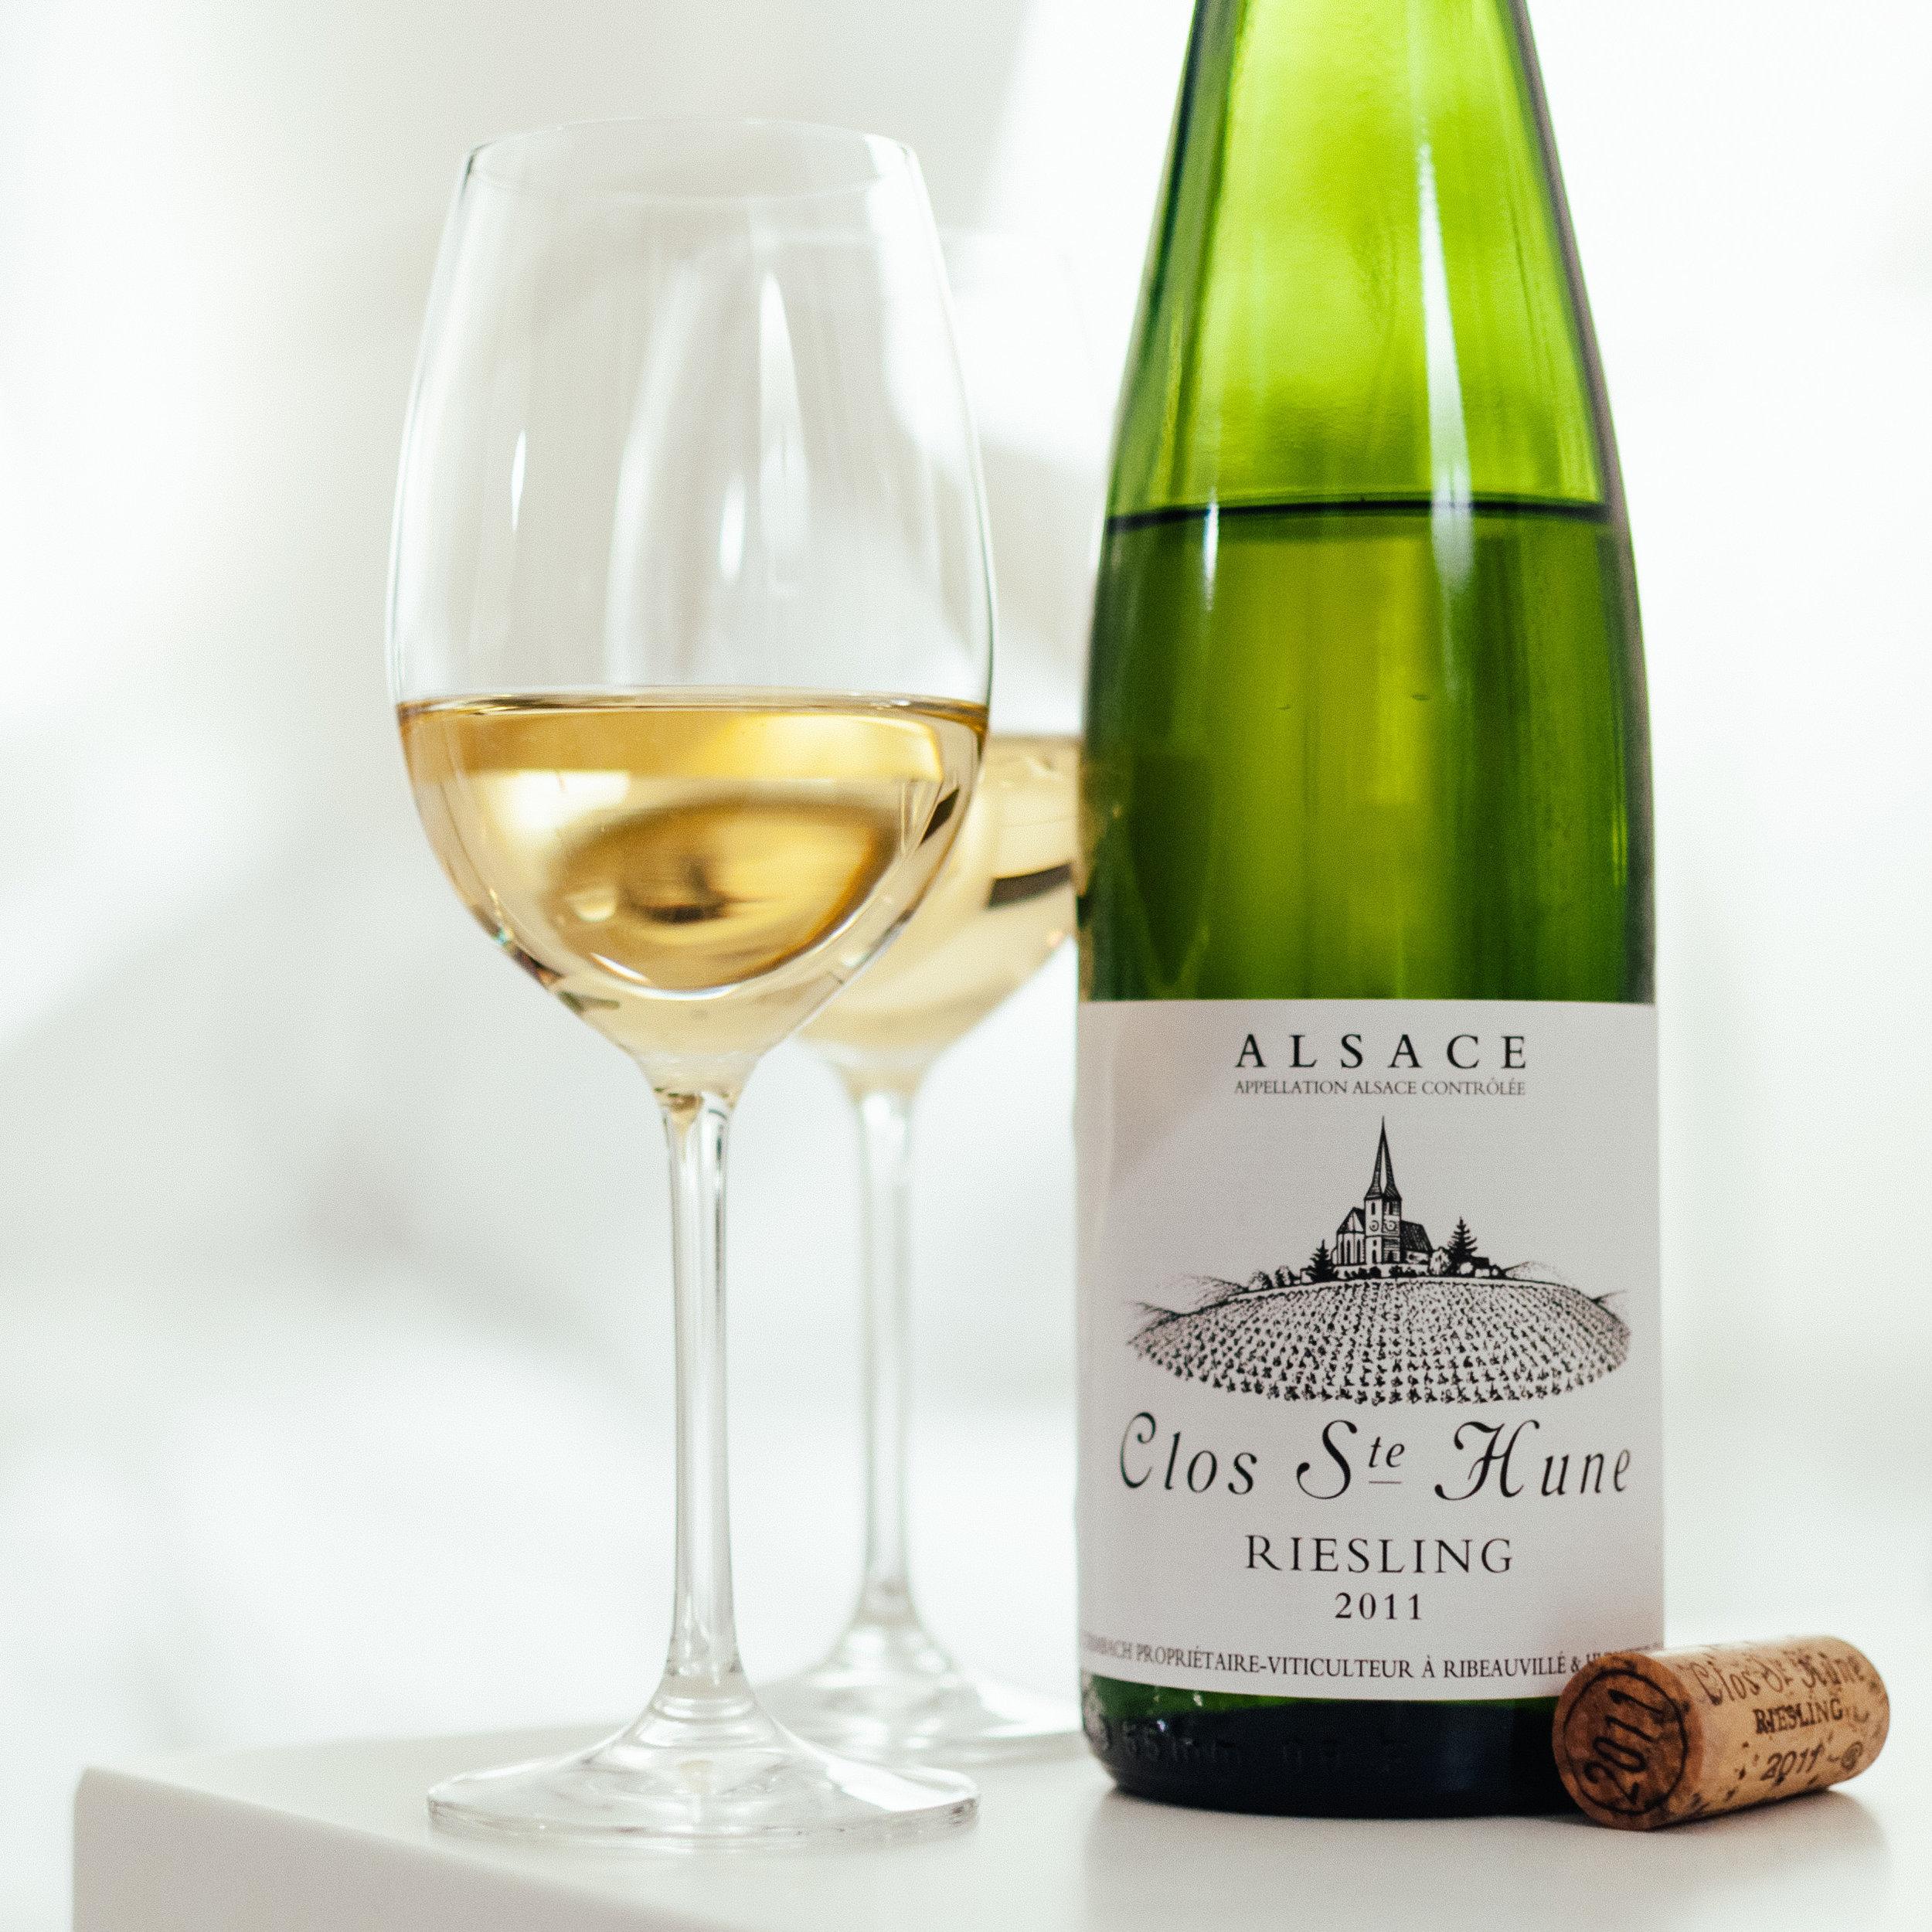 Clos Ste Hune Alsace